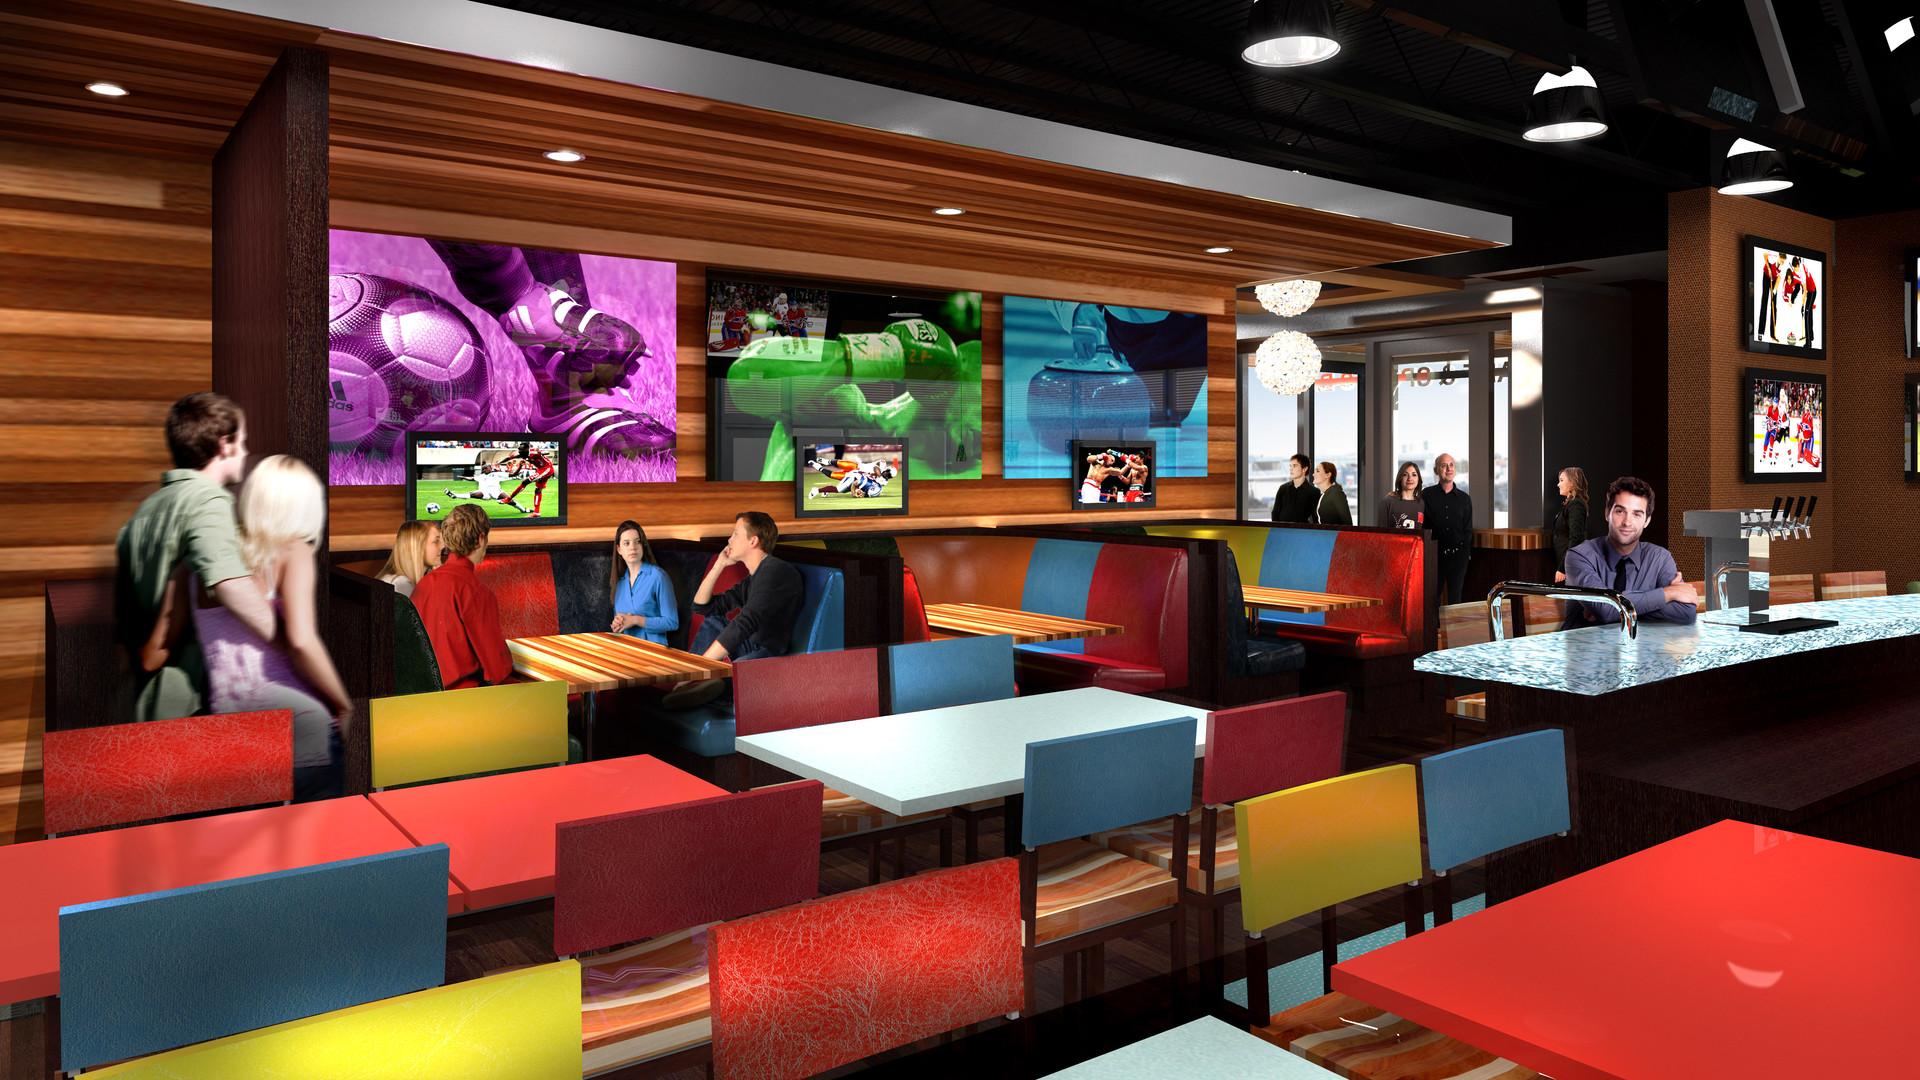 Boston Pizza Interior Seating Render